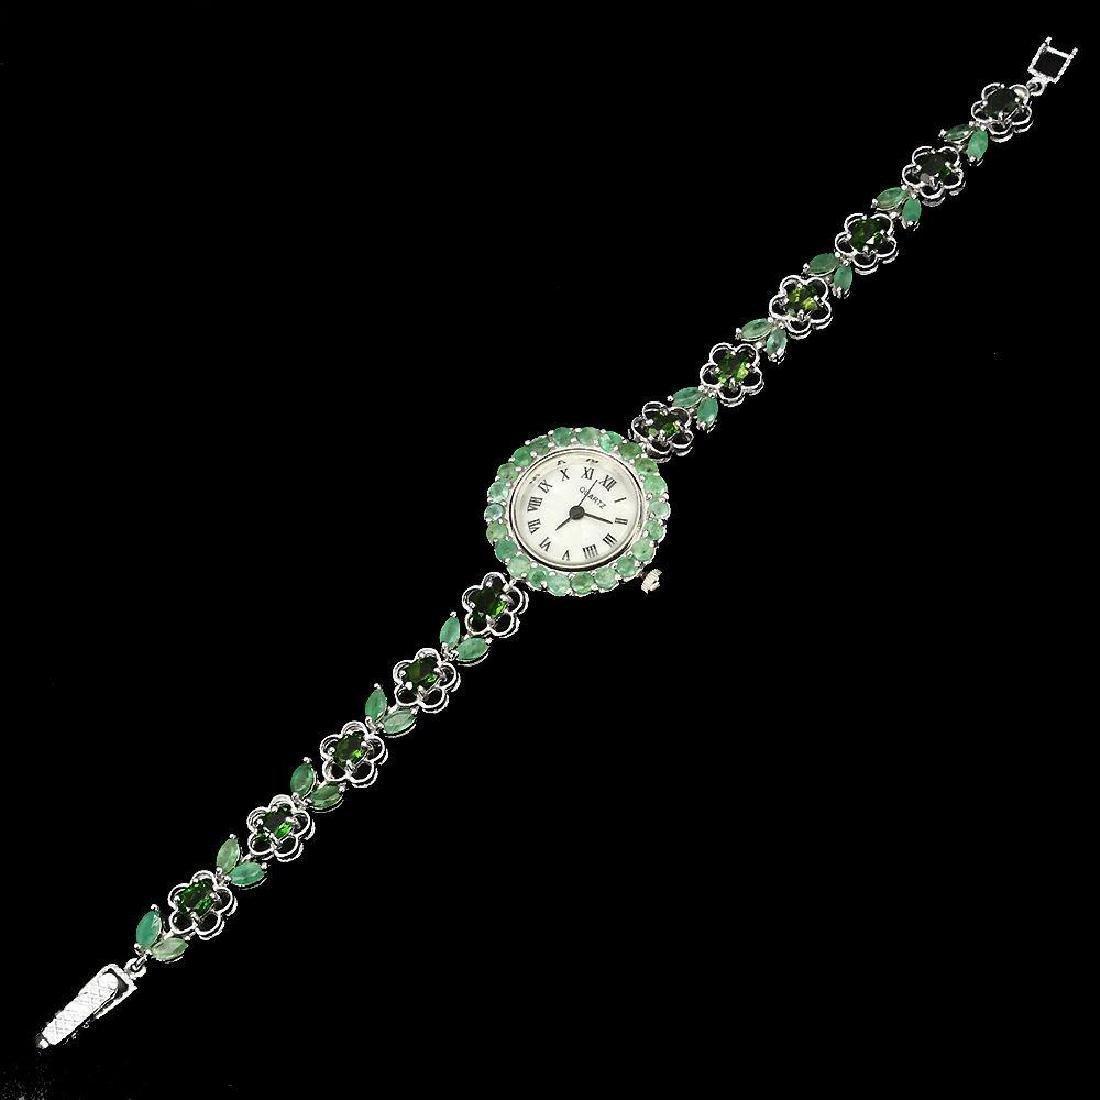 Sterling Silver Emerald & Tourmaline Watch, 8.11ctw - 3